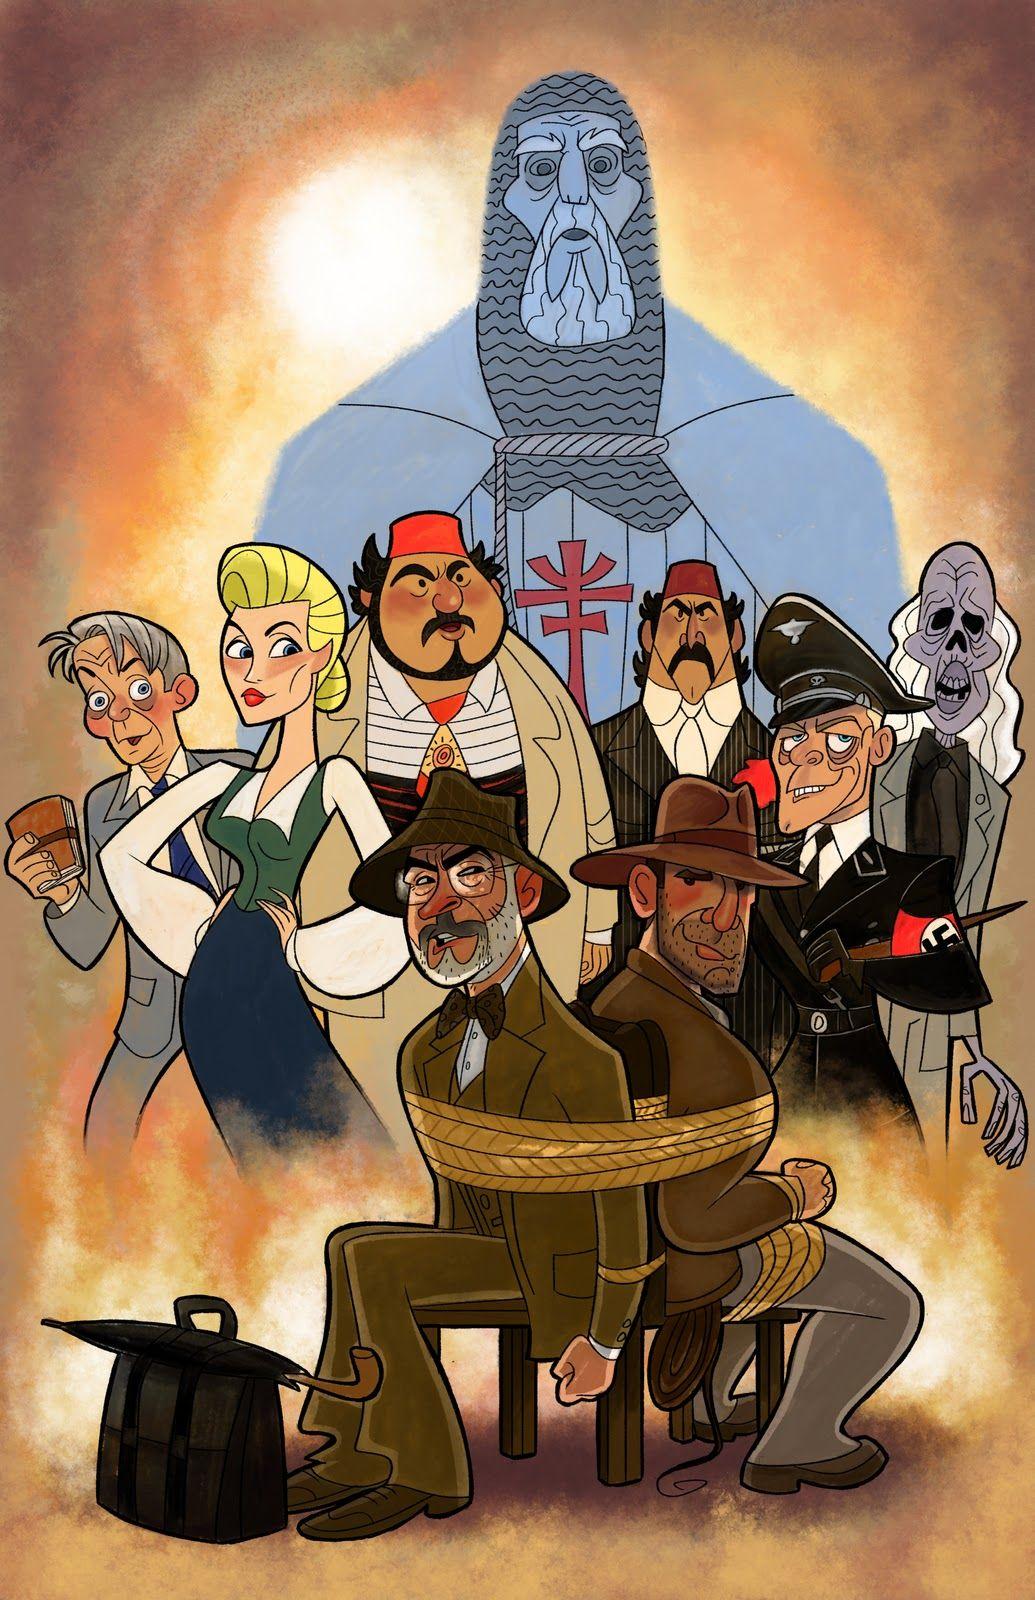 Dork Art Indiana Jones And The Last Crusade Indiana Jones Films Indiana Jones Character Design